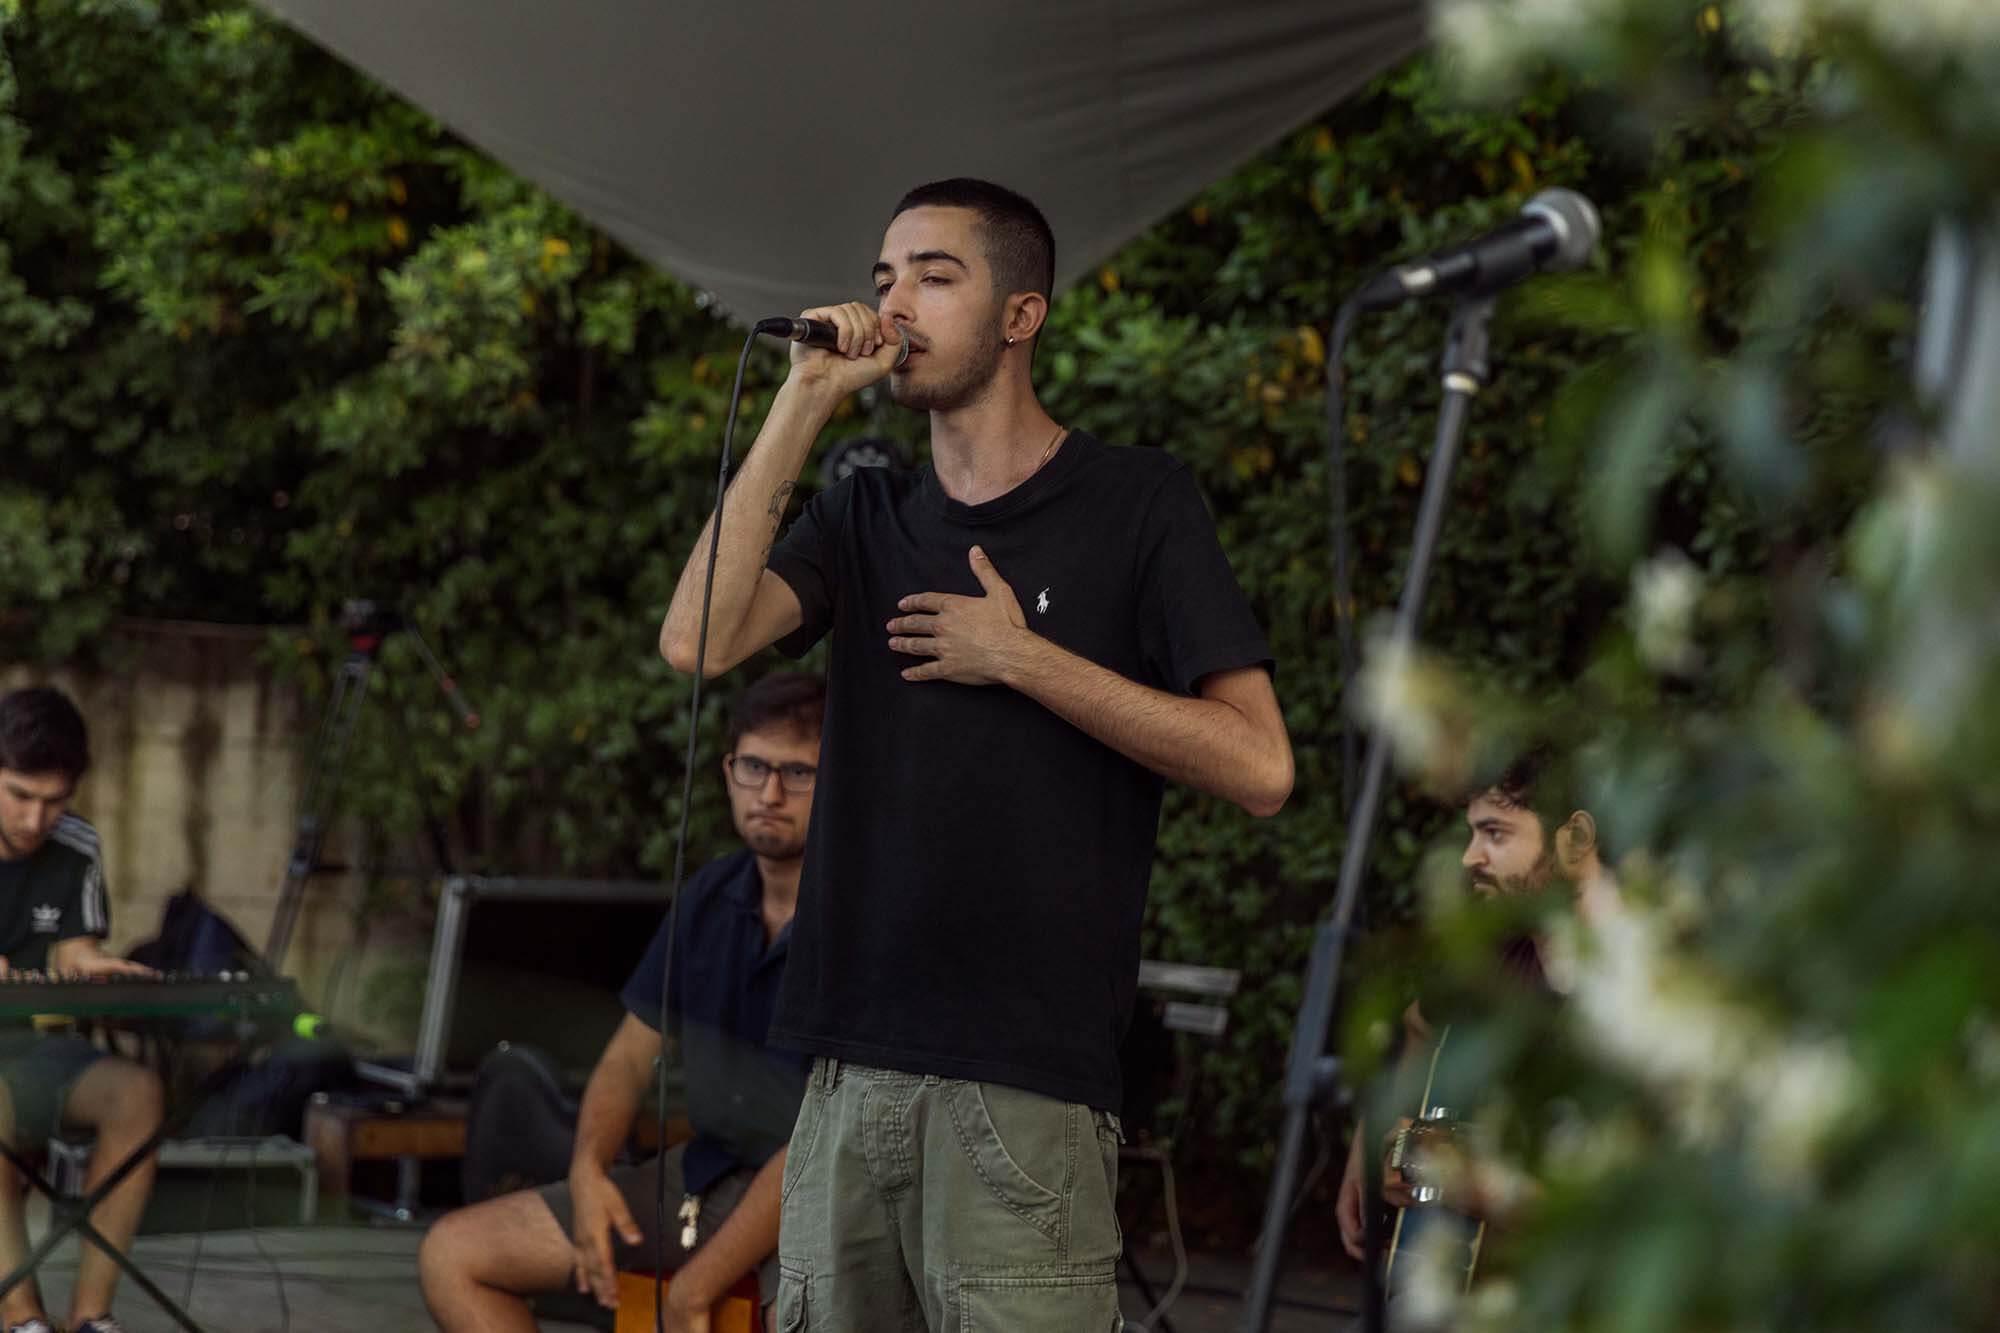 bma-bologna-musica-dautore-fonoprint-about-bologna-4